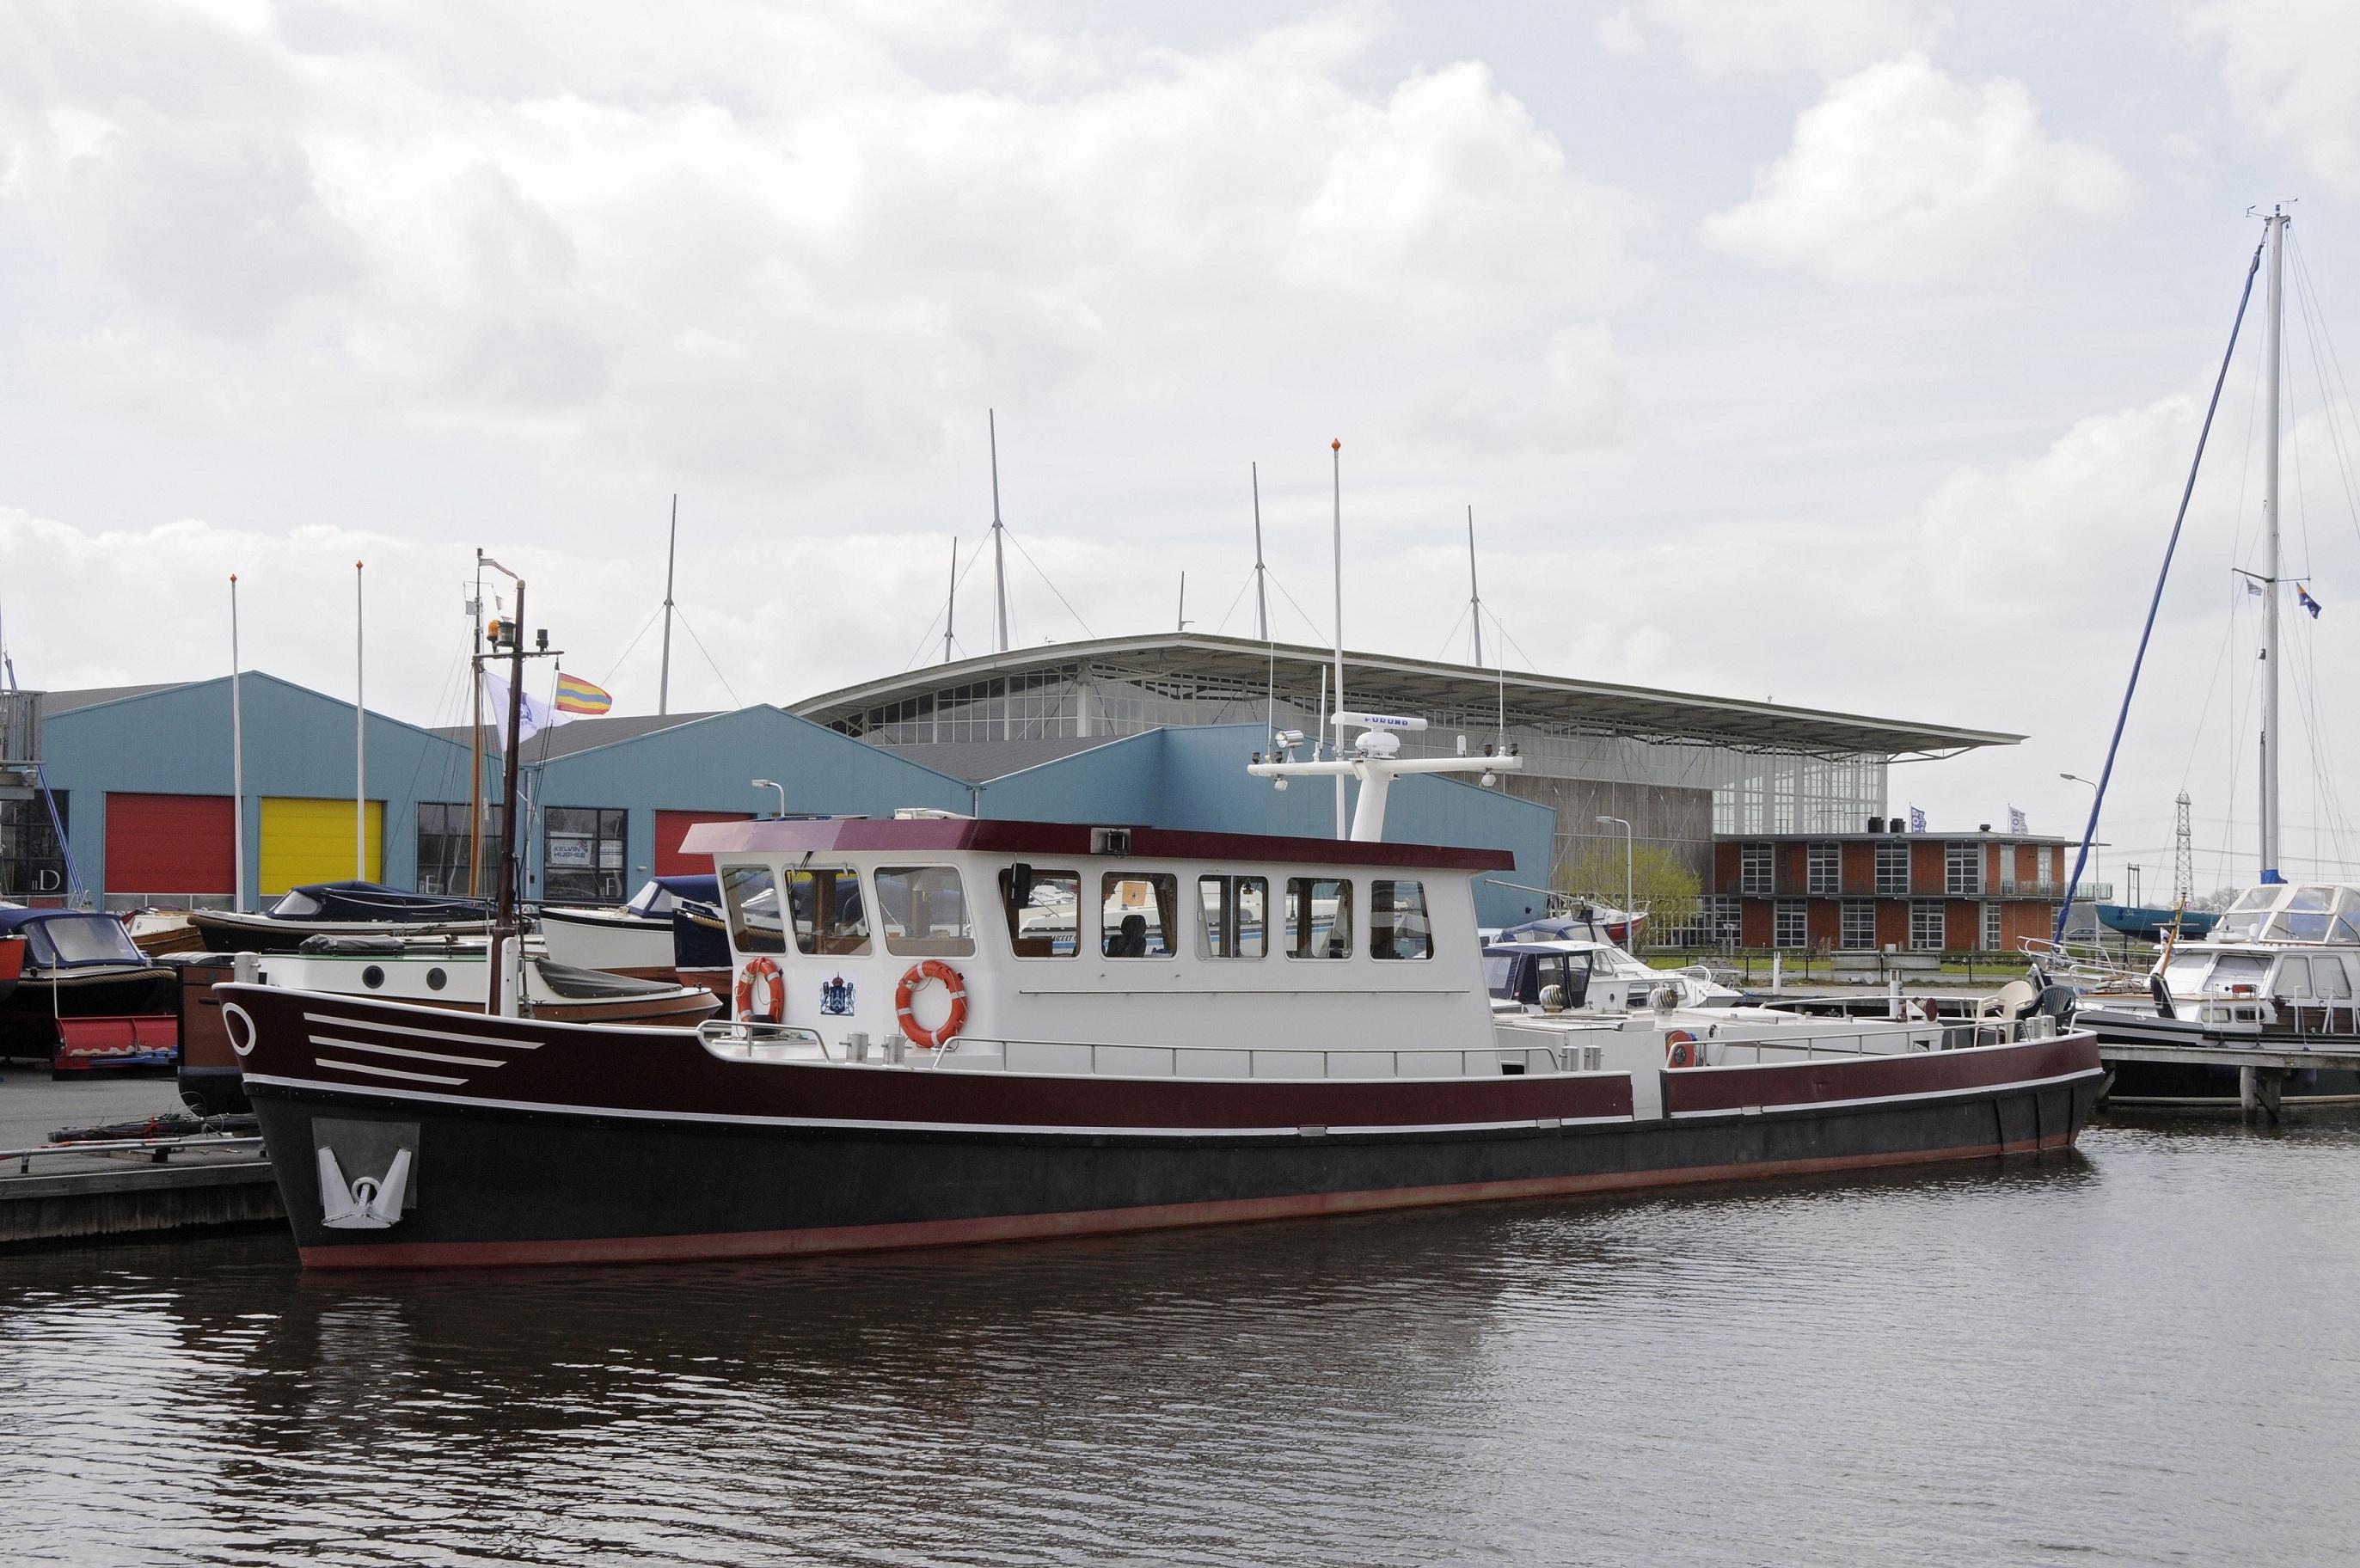 Rondvaart Sleper